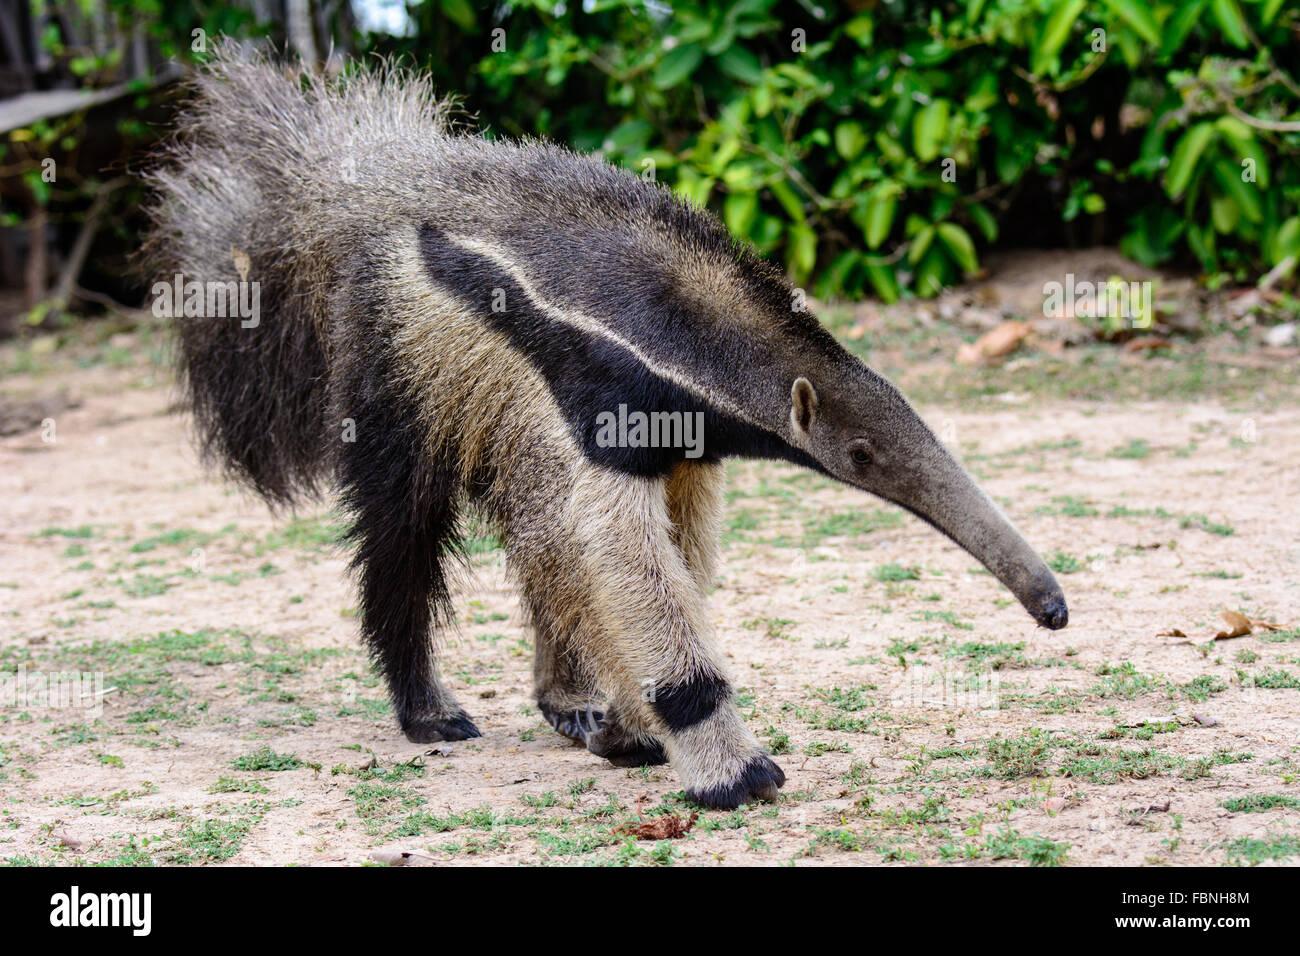 Großer Ameisenbär unterwegs Stockbild